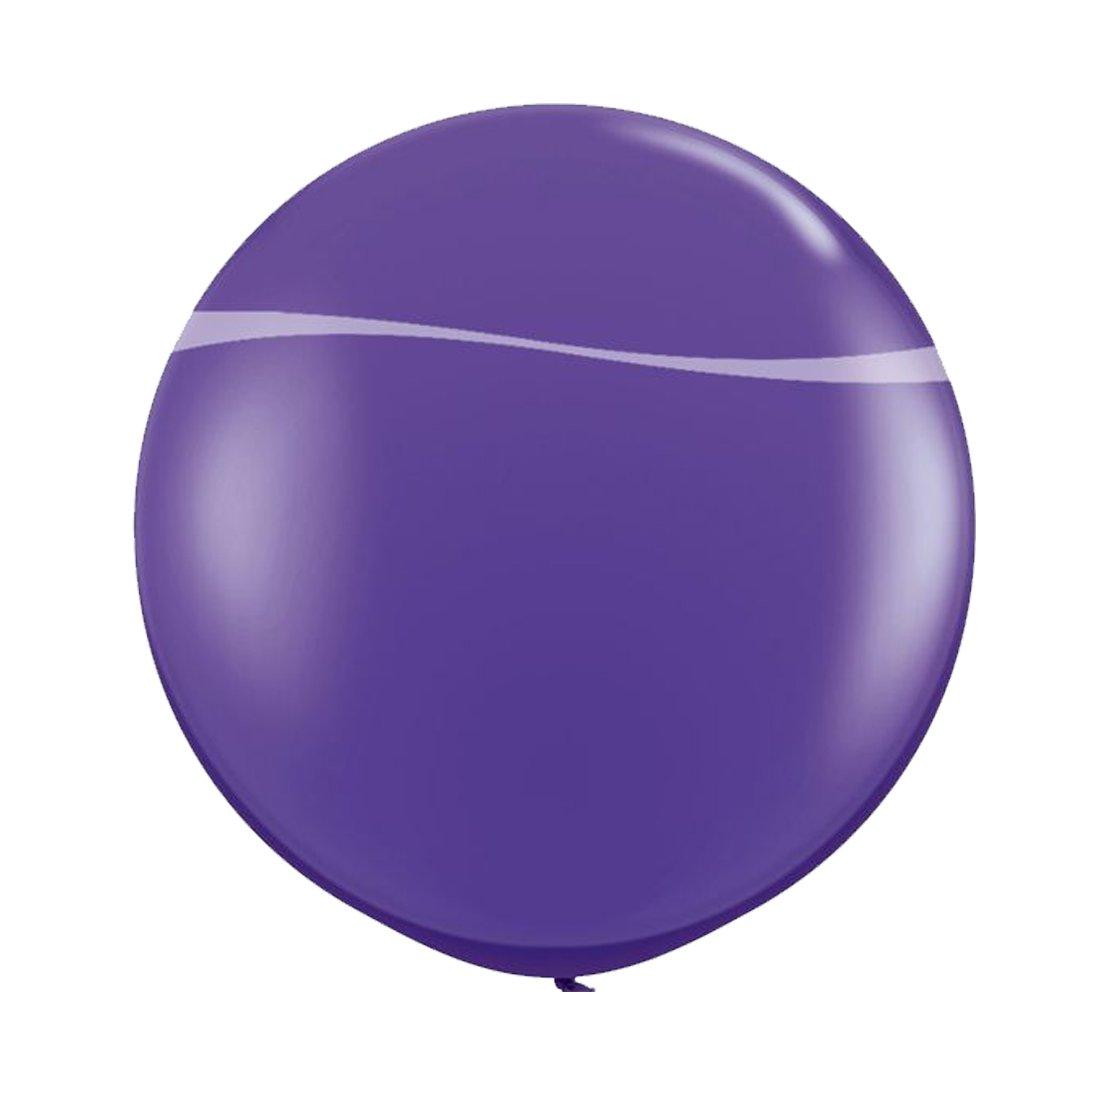 NET TOYS Globo Gigante 90cm - Violeta | Globo de Cumpleaños ...